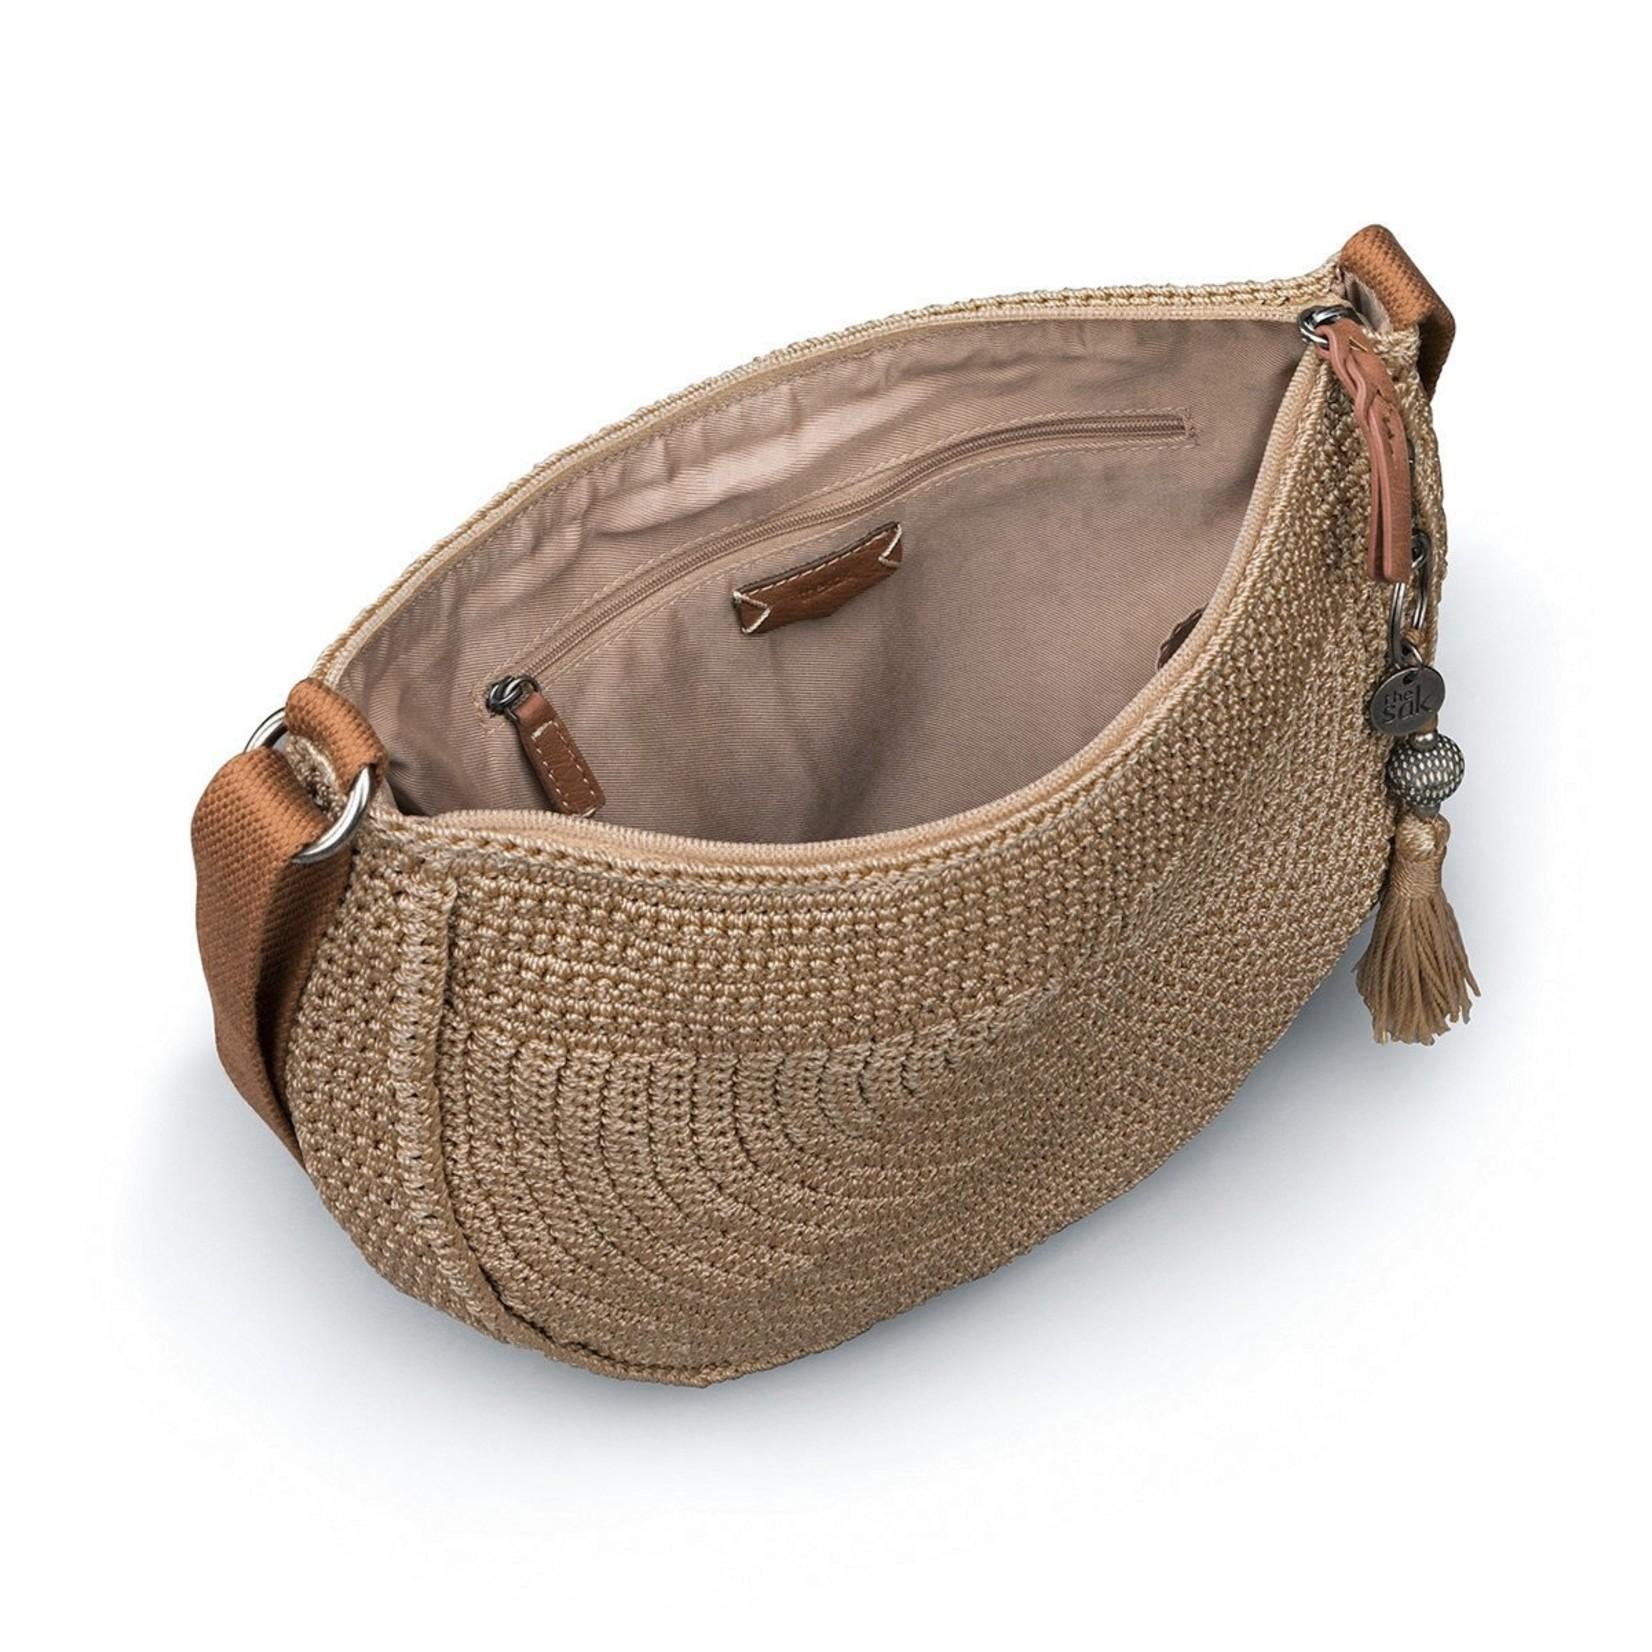 The Sak Ryder Crochet Crossbody - Bamboo